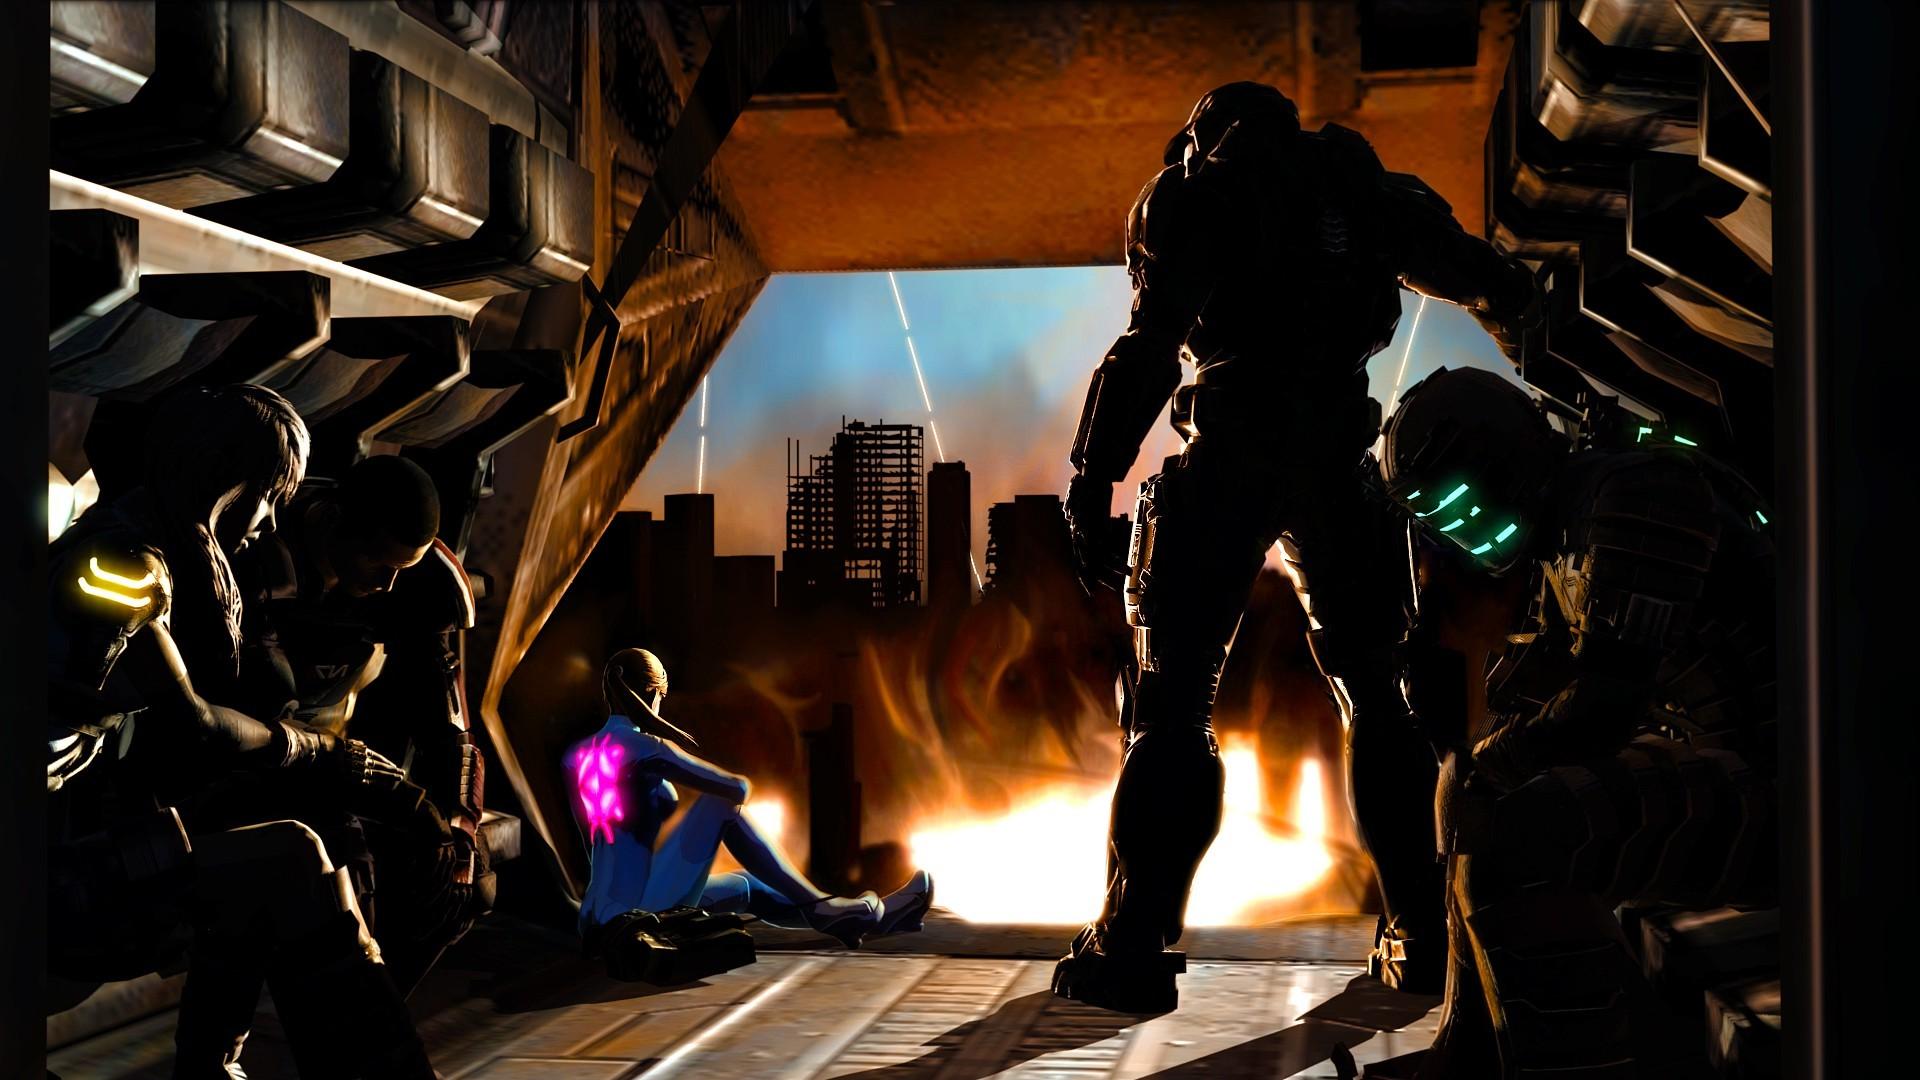 Dead Space, Mass Effect, Final Fantasy XIII, Halo, Metroid, Samus Aran,  Master Chief, Commander Shepard Wallpapers HD / Desktop and Mobile  Backgrounds